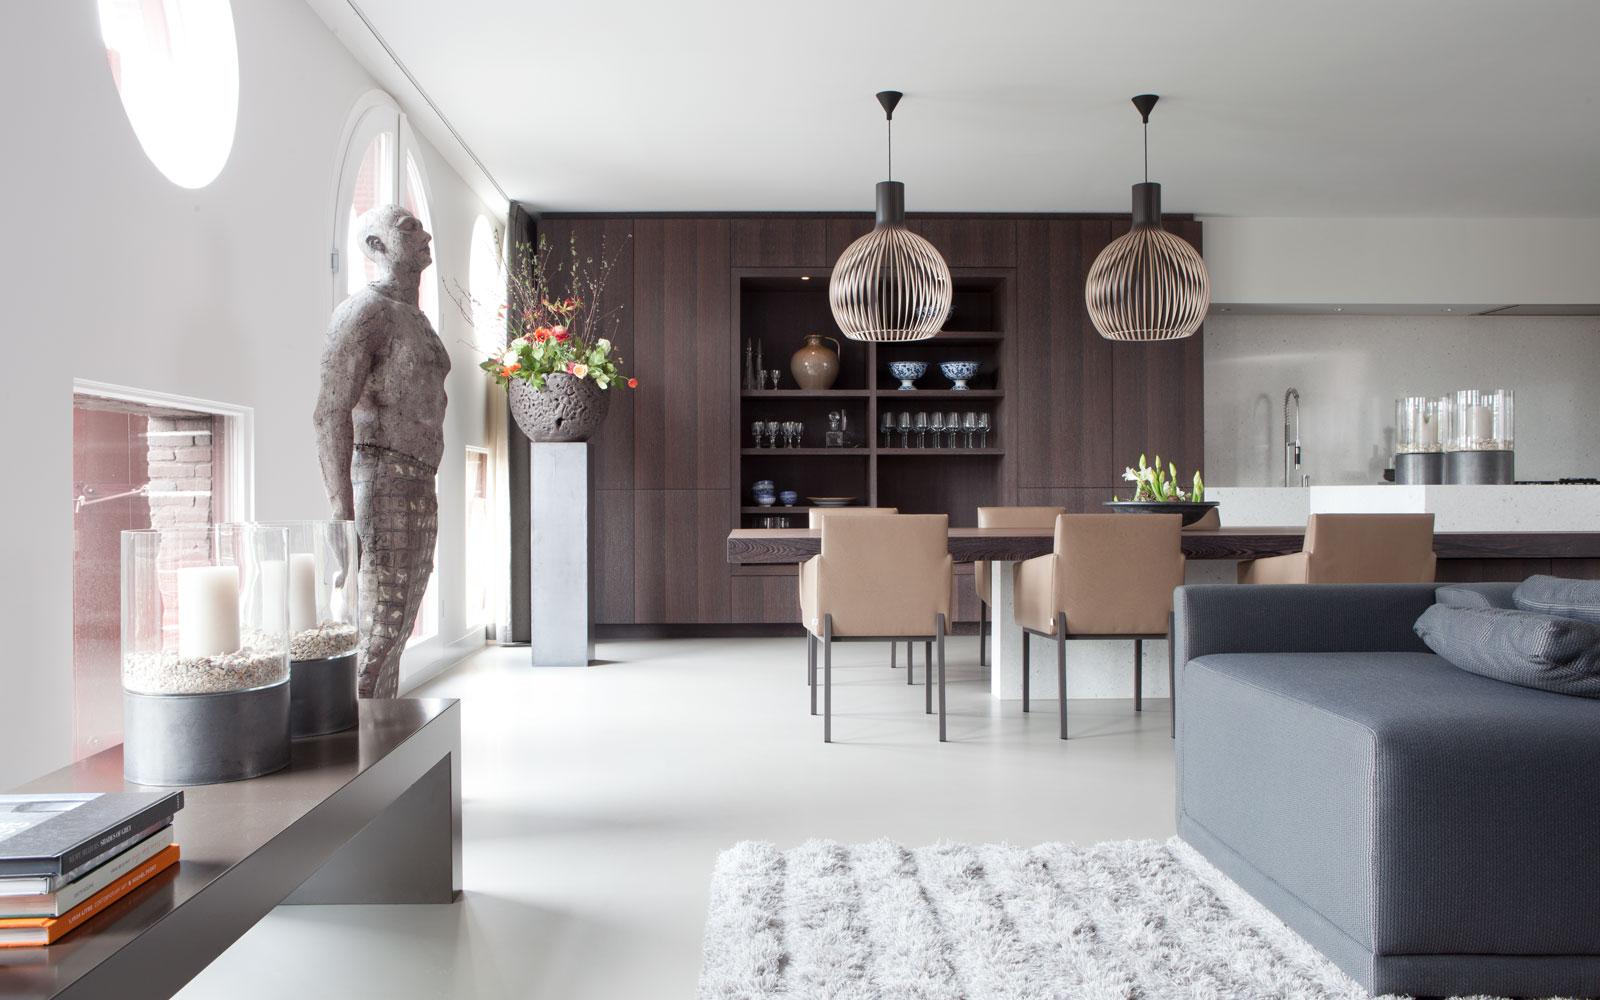 Woonkamer, keuken, open verbinding, maatwerk kast, Bom Interieurs, gietvloer, Senso, Penthouse Amsterdam, Remy Meijers